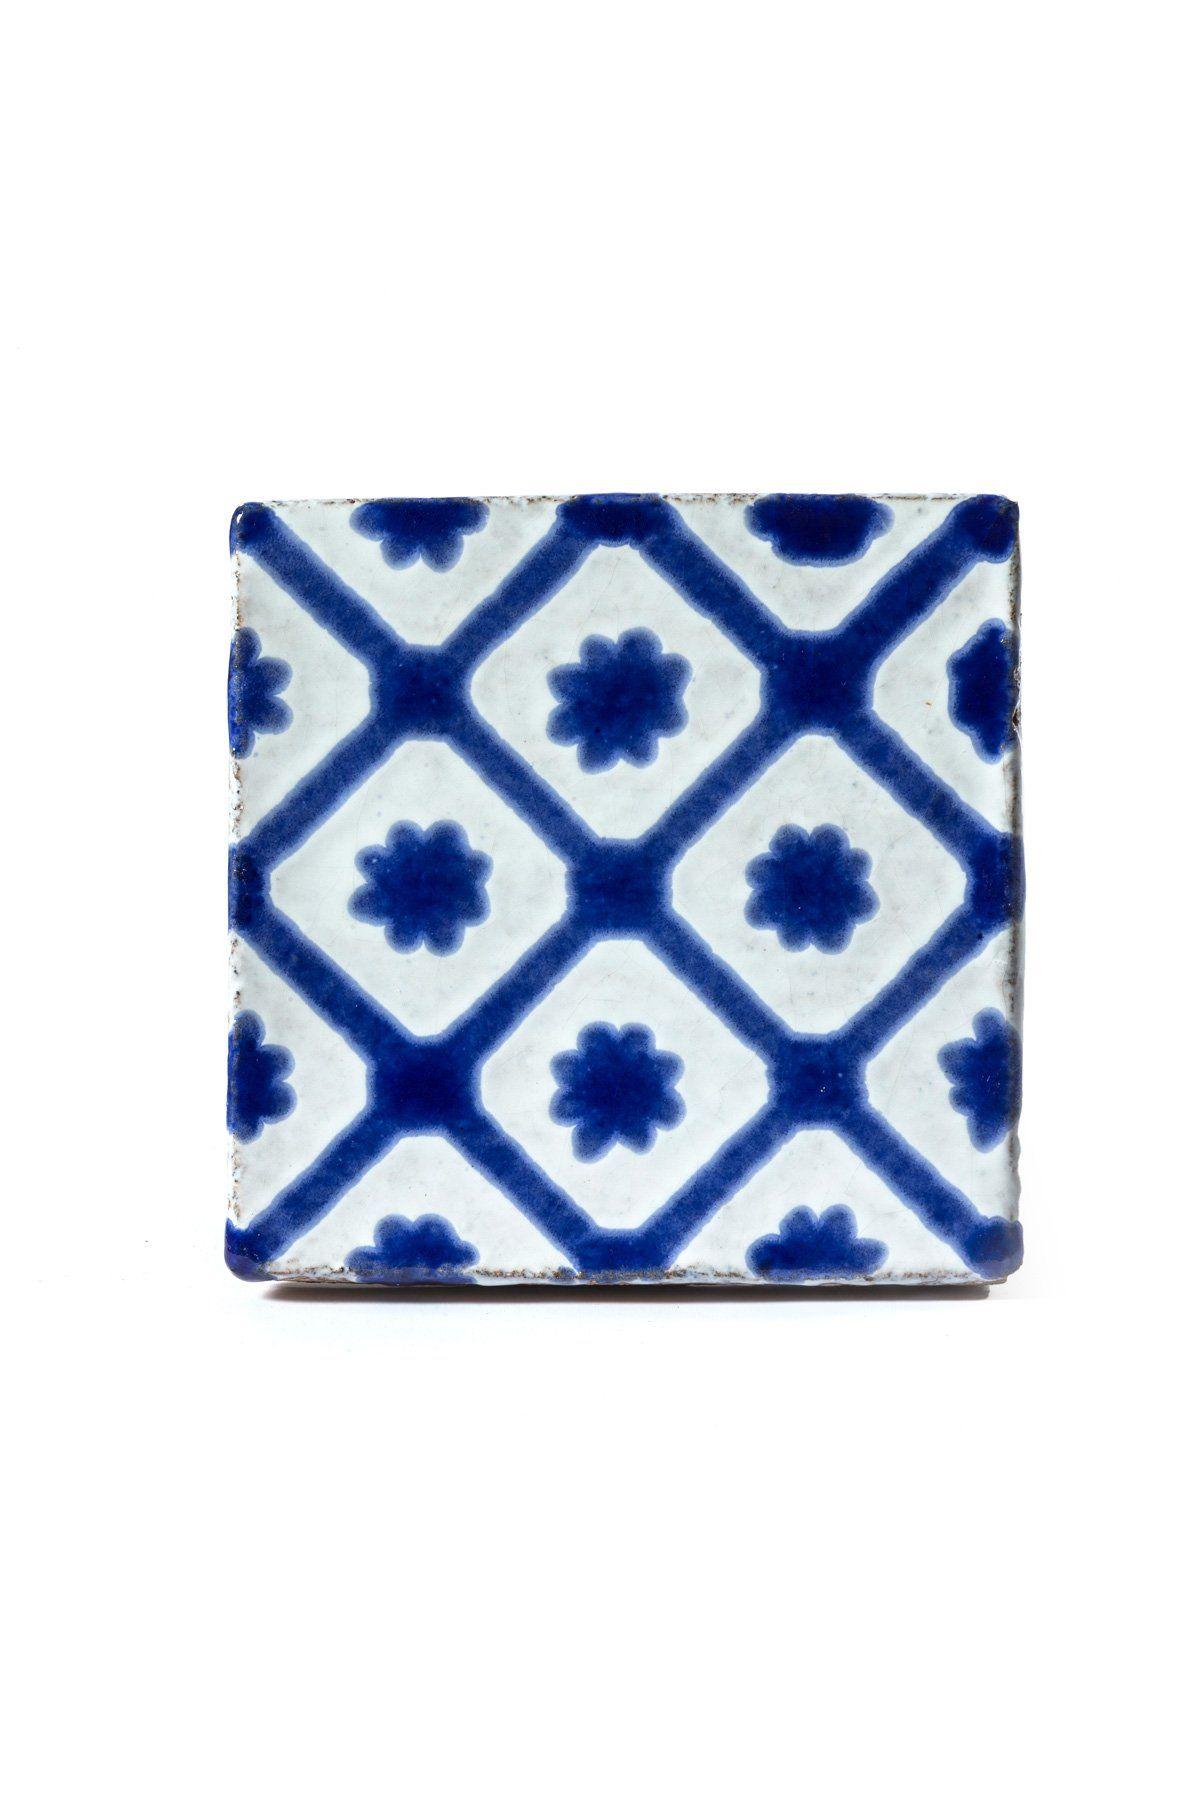 Hand glazed ceramic tile 10x10 hand glazed ceramic tile the handicraft company pecchioli ceramics firenze born in the late nineteenth century is located in borgo san lorenzo close to dailygadgetfo Choice Image